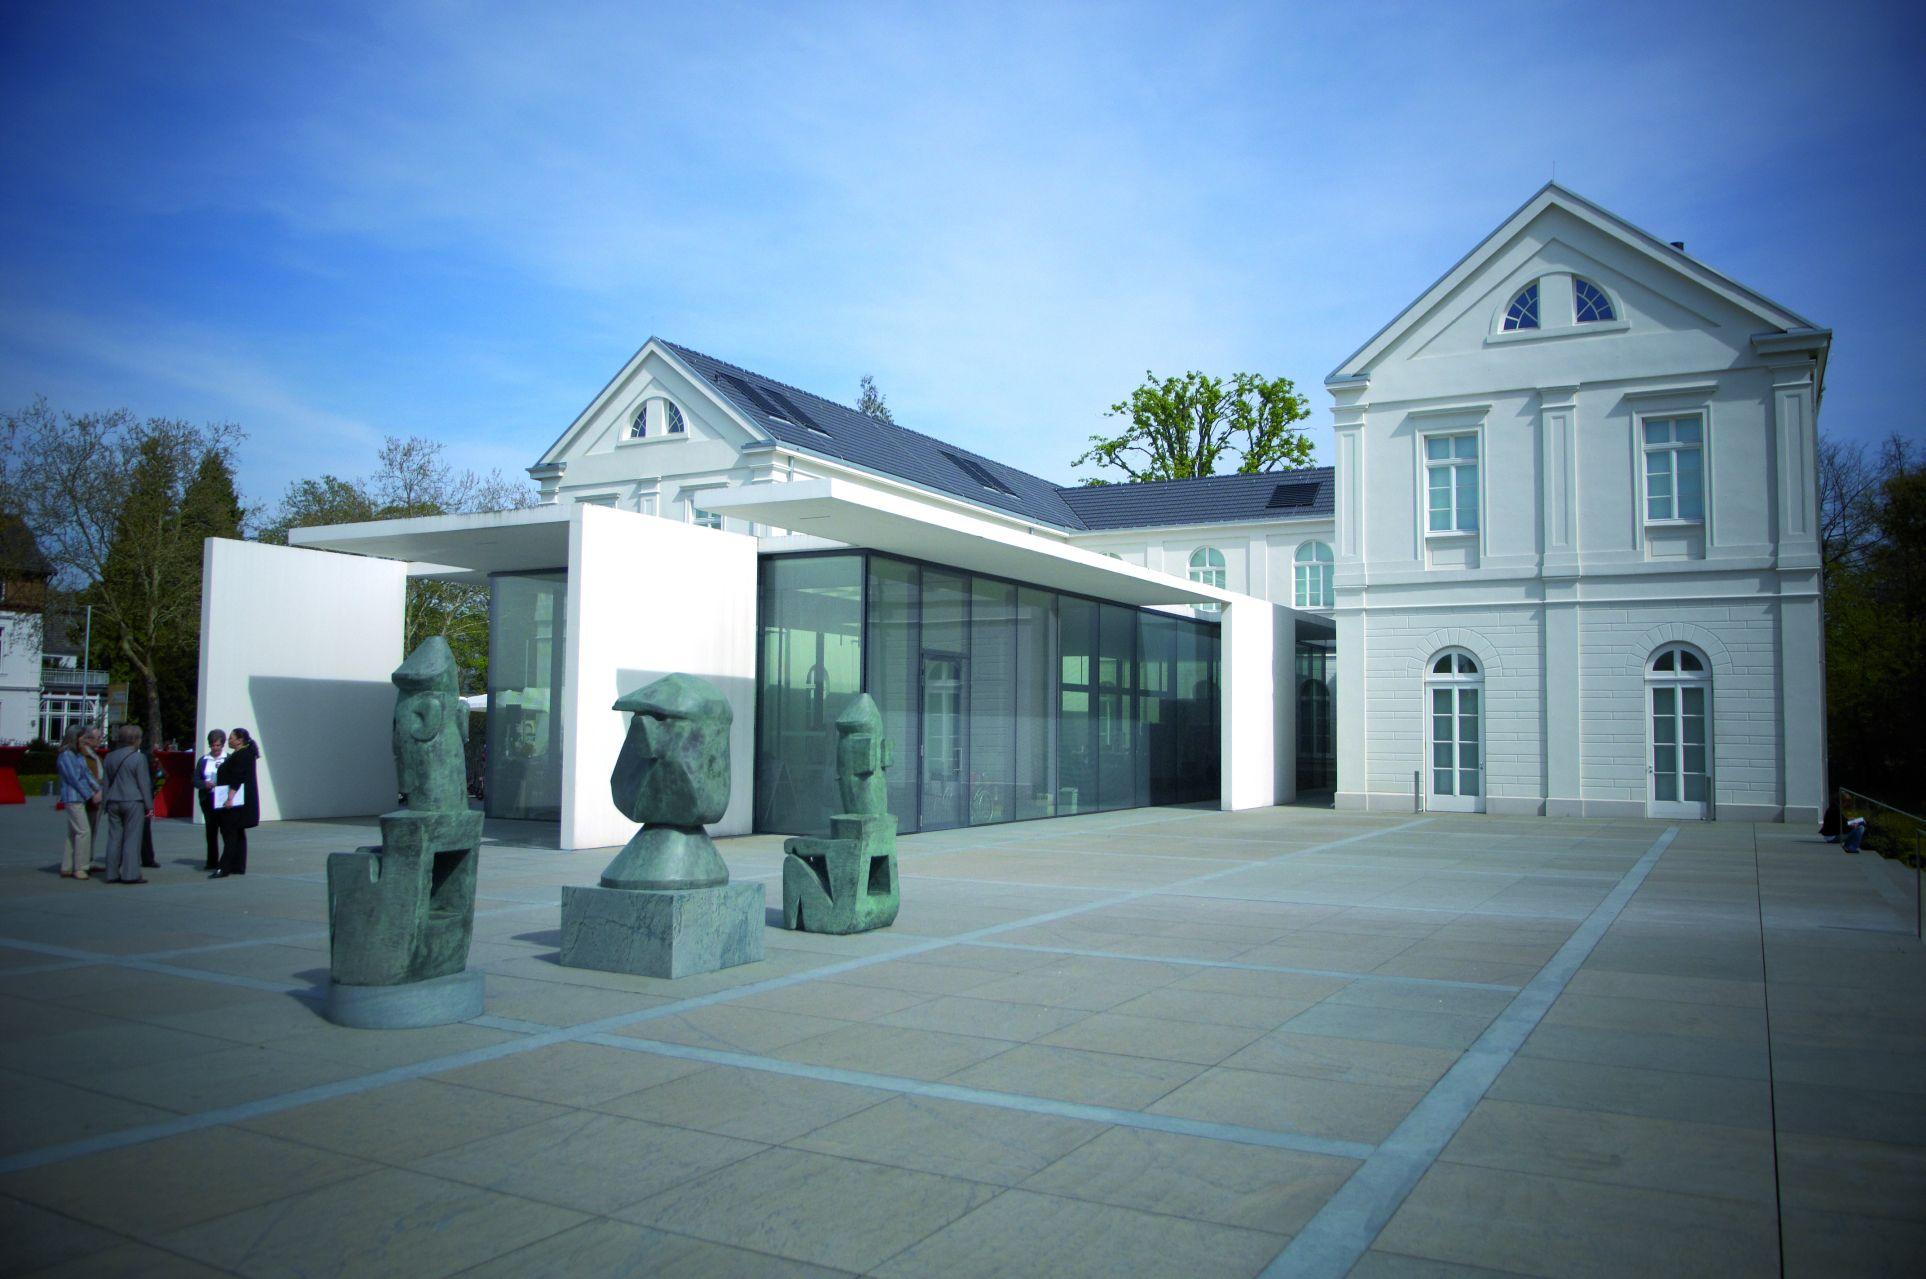 bruhl-max-ernst-museum-bruhl4